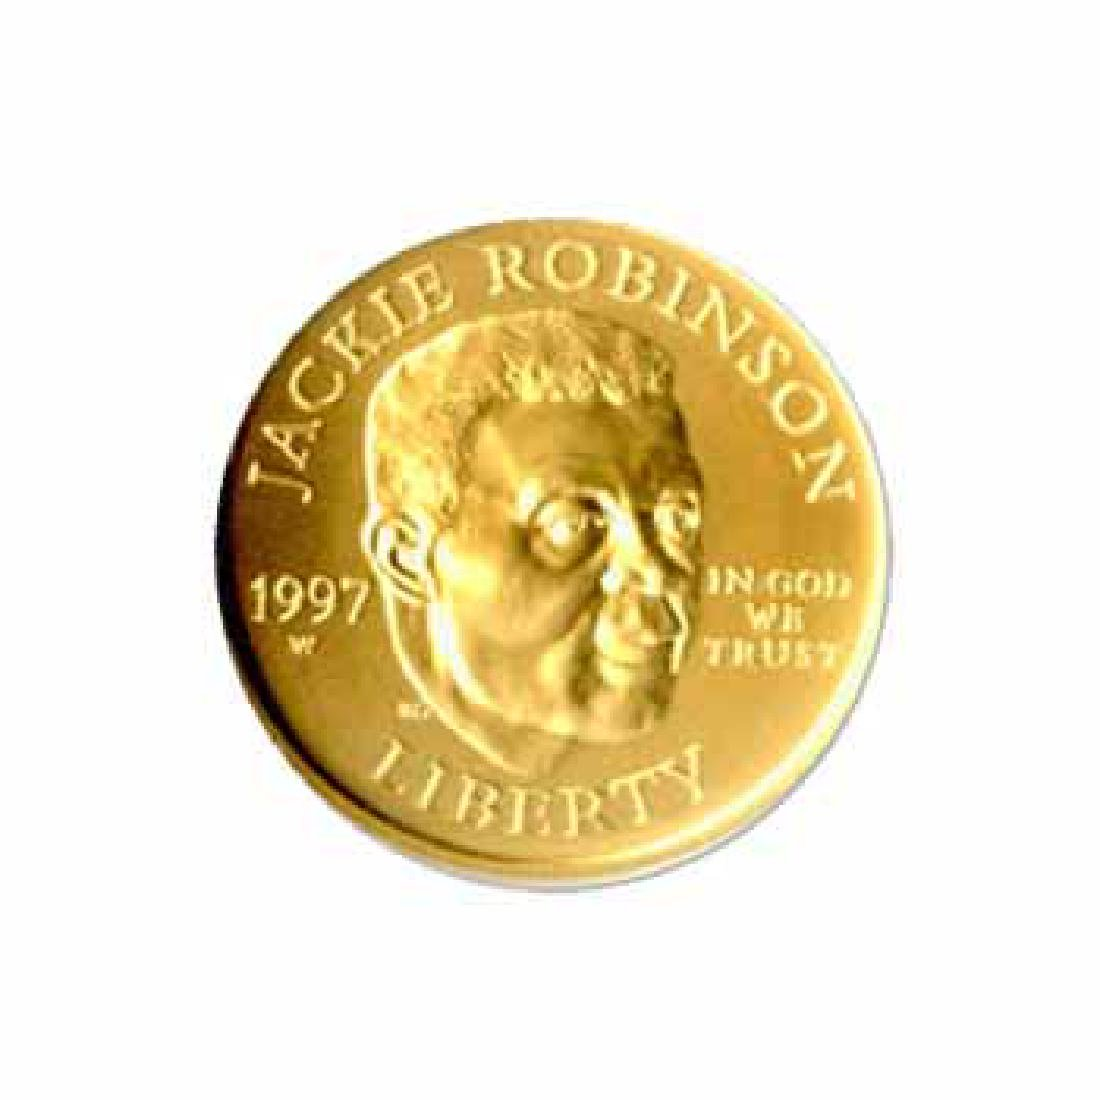 Gold $5 Commemorative 1997 Robinson Uncirculated